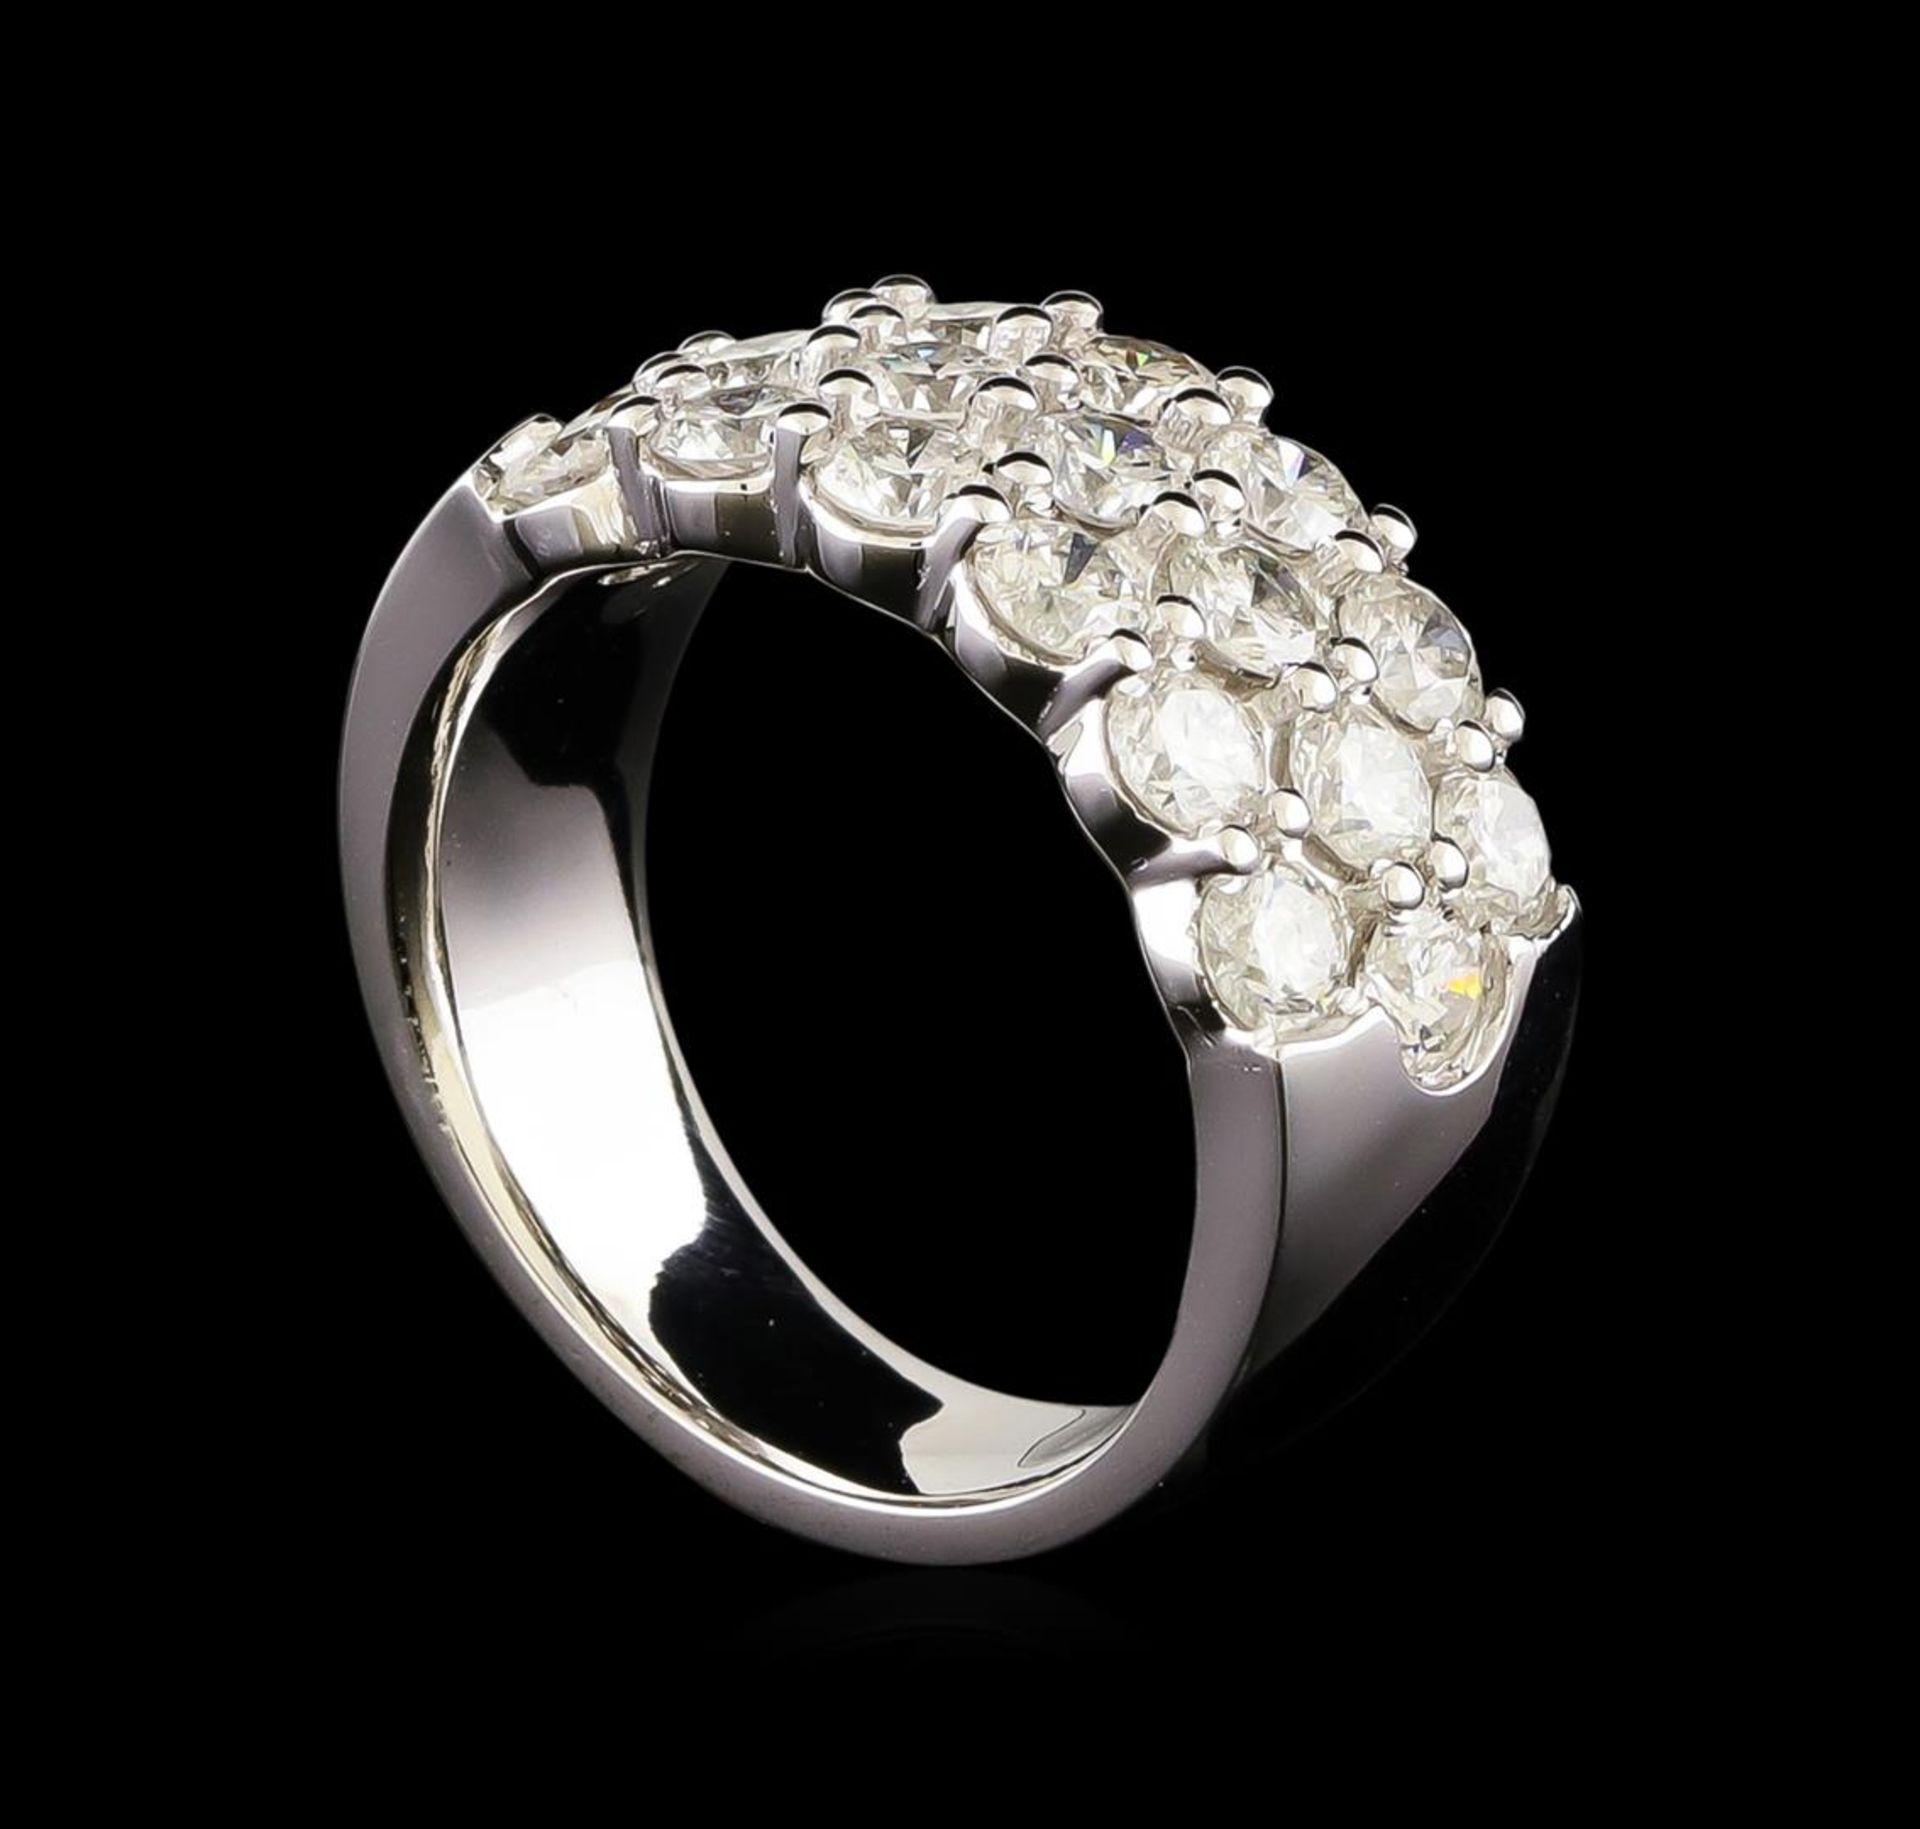 14KT White Gold 2.98 ctw Diamond Ring - Image 4 of 5